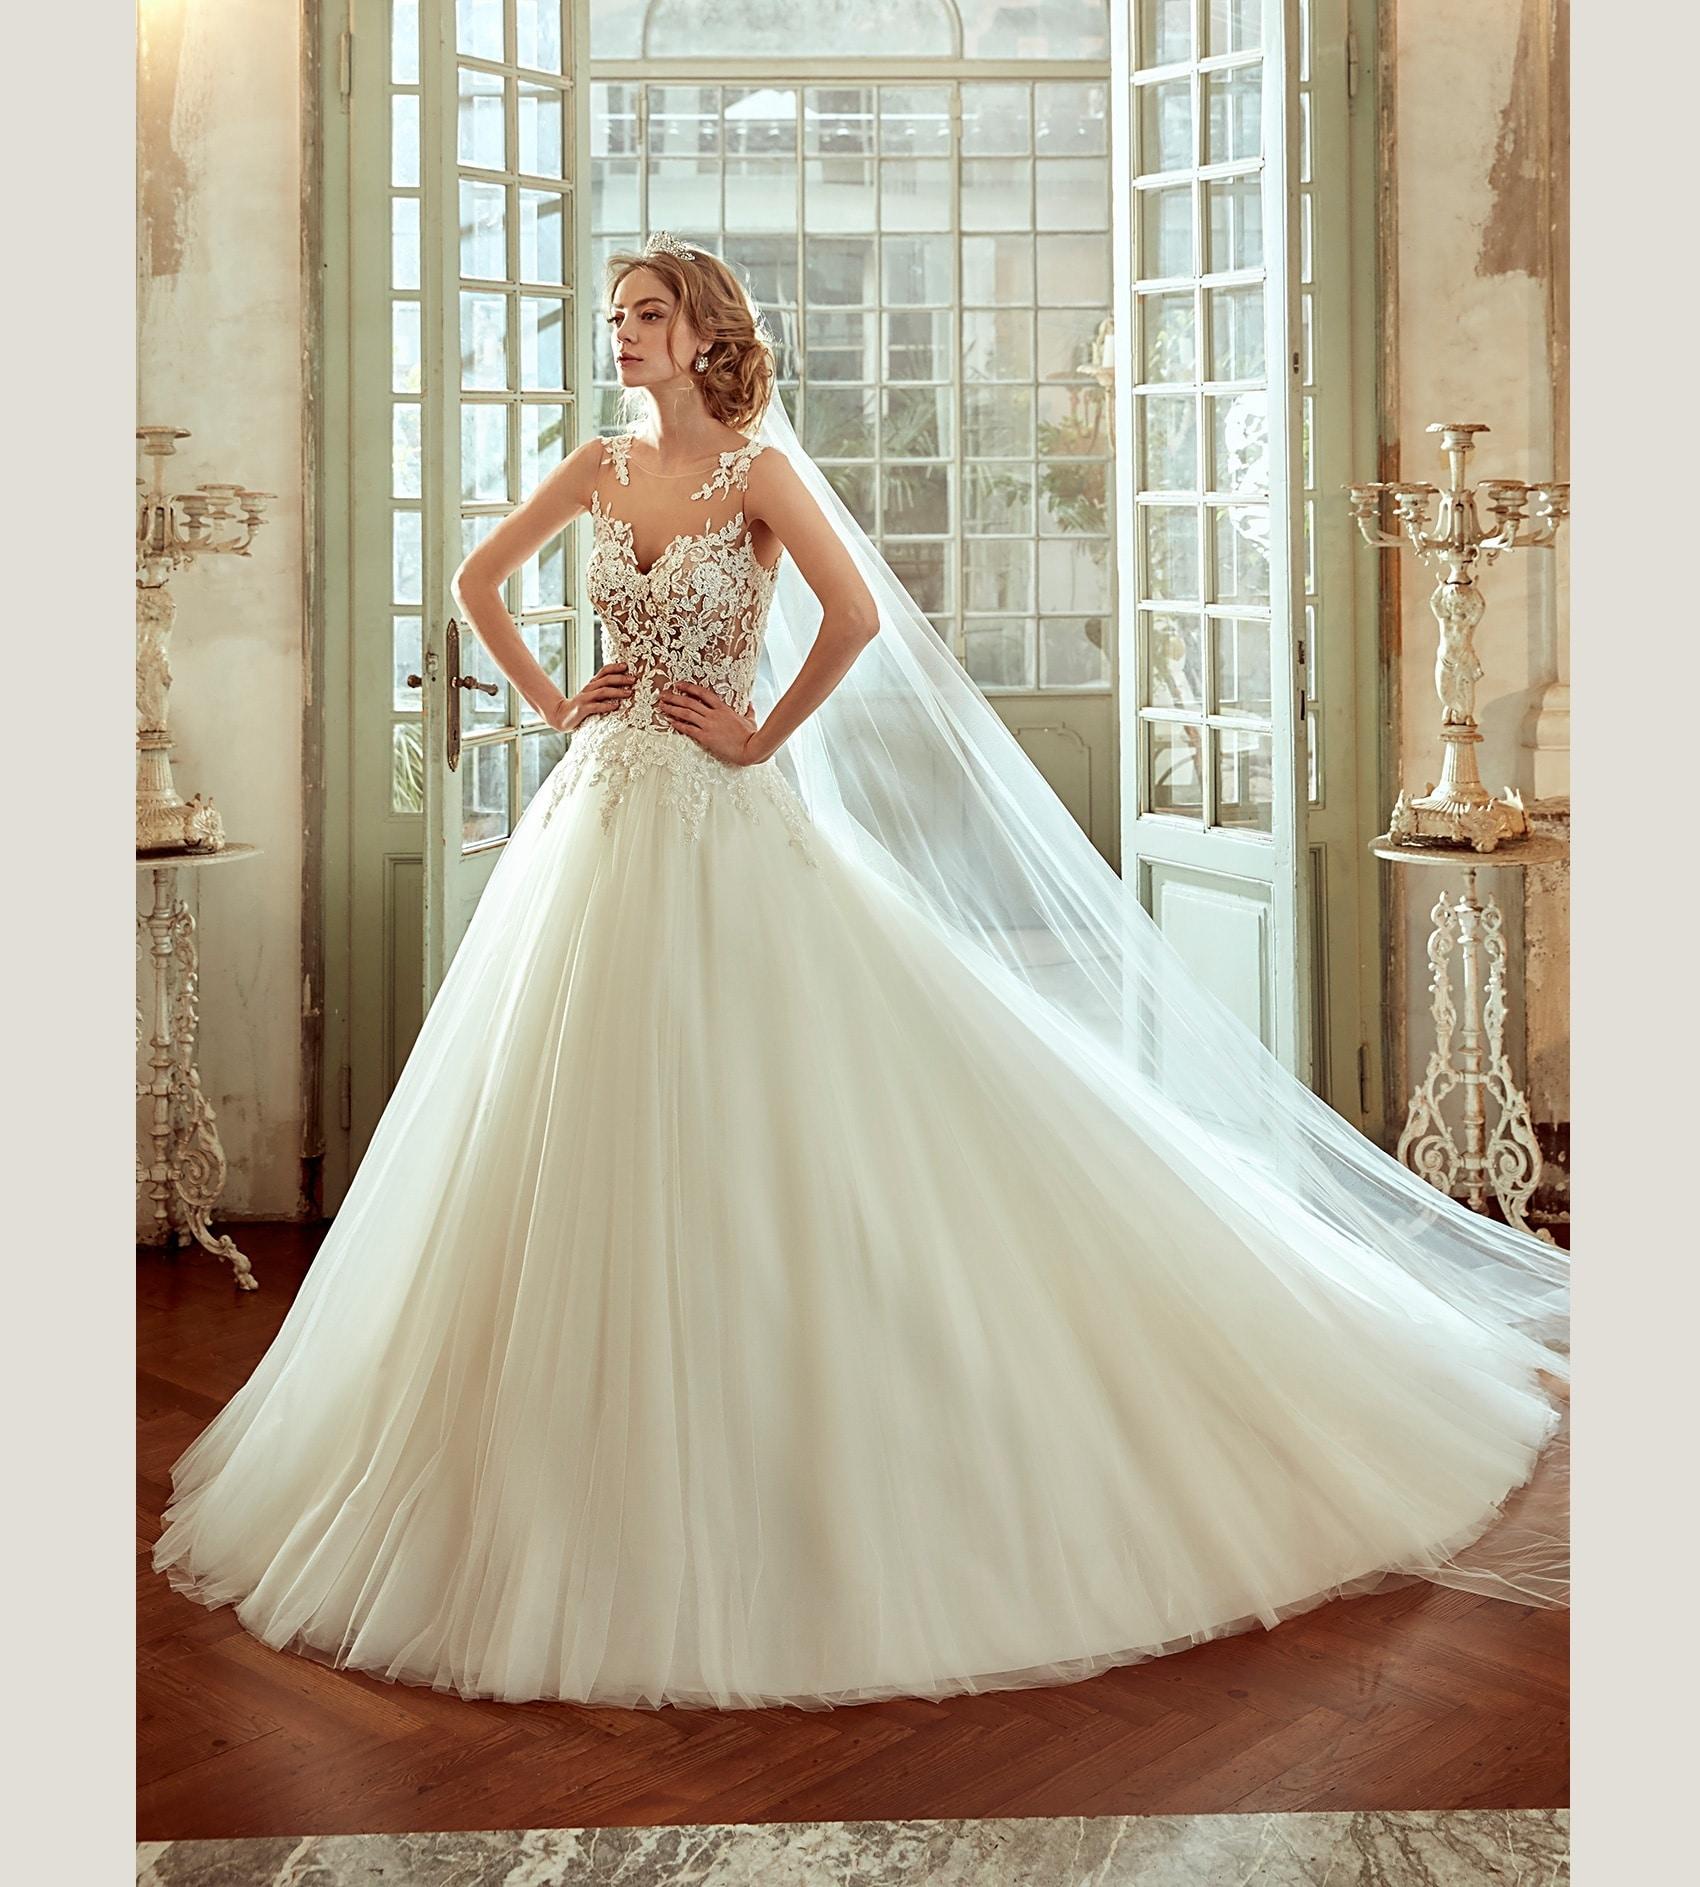 Robes de mari e nicole spose showroom lyne mariage for Prix de robe de mariage nicole